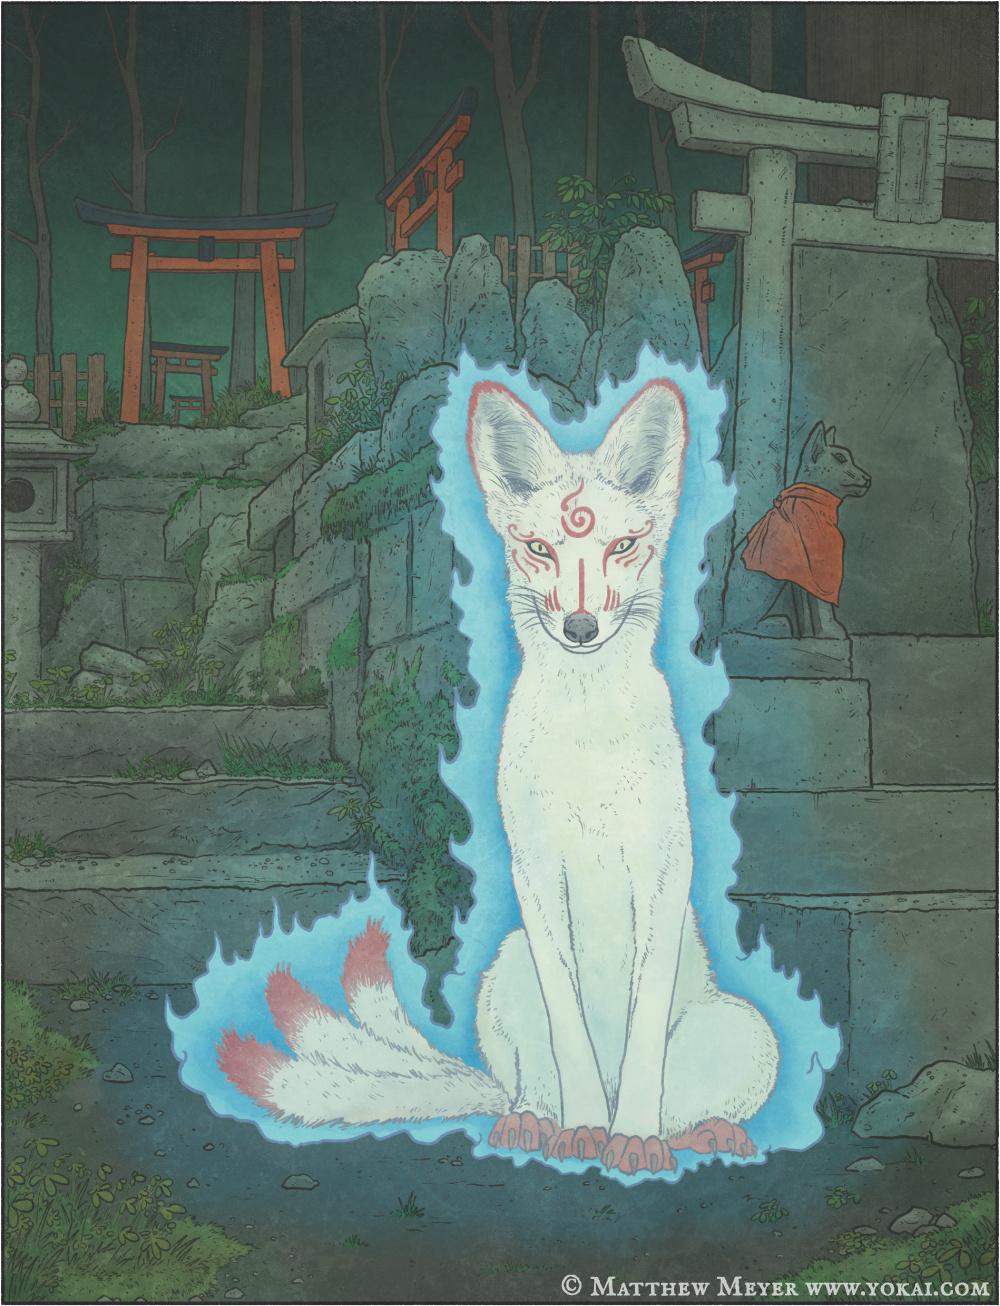 Kiko Yokai Com While the beast is generally calm and harmless, during thunderstorms it becomes. yokai com